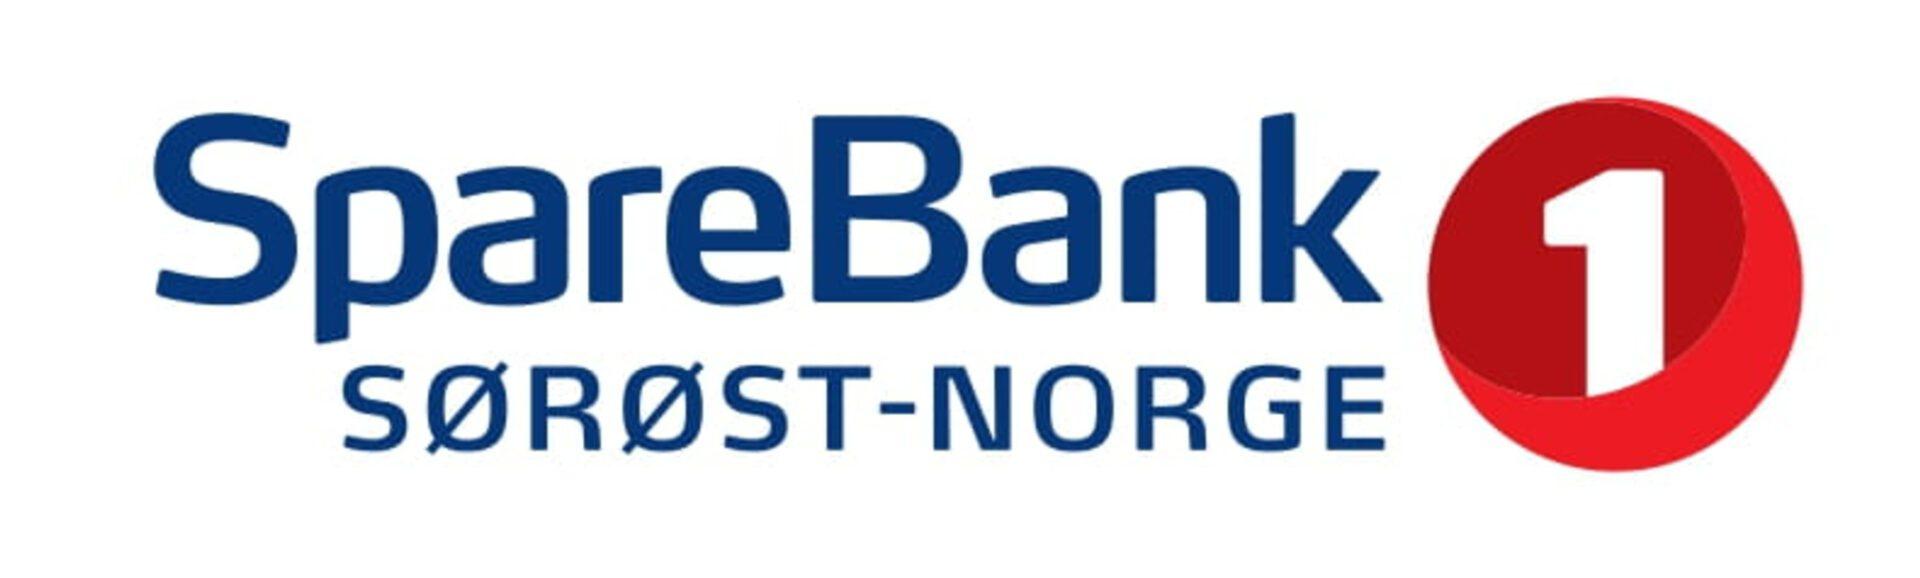 Sparebank 1 sør logo